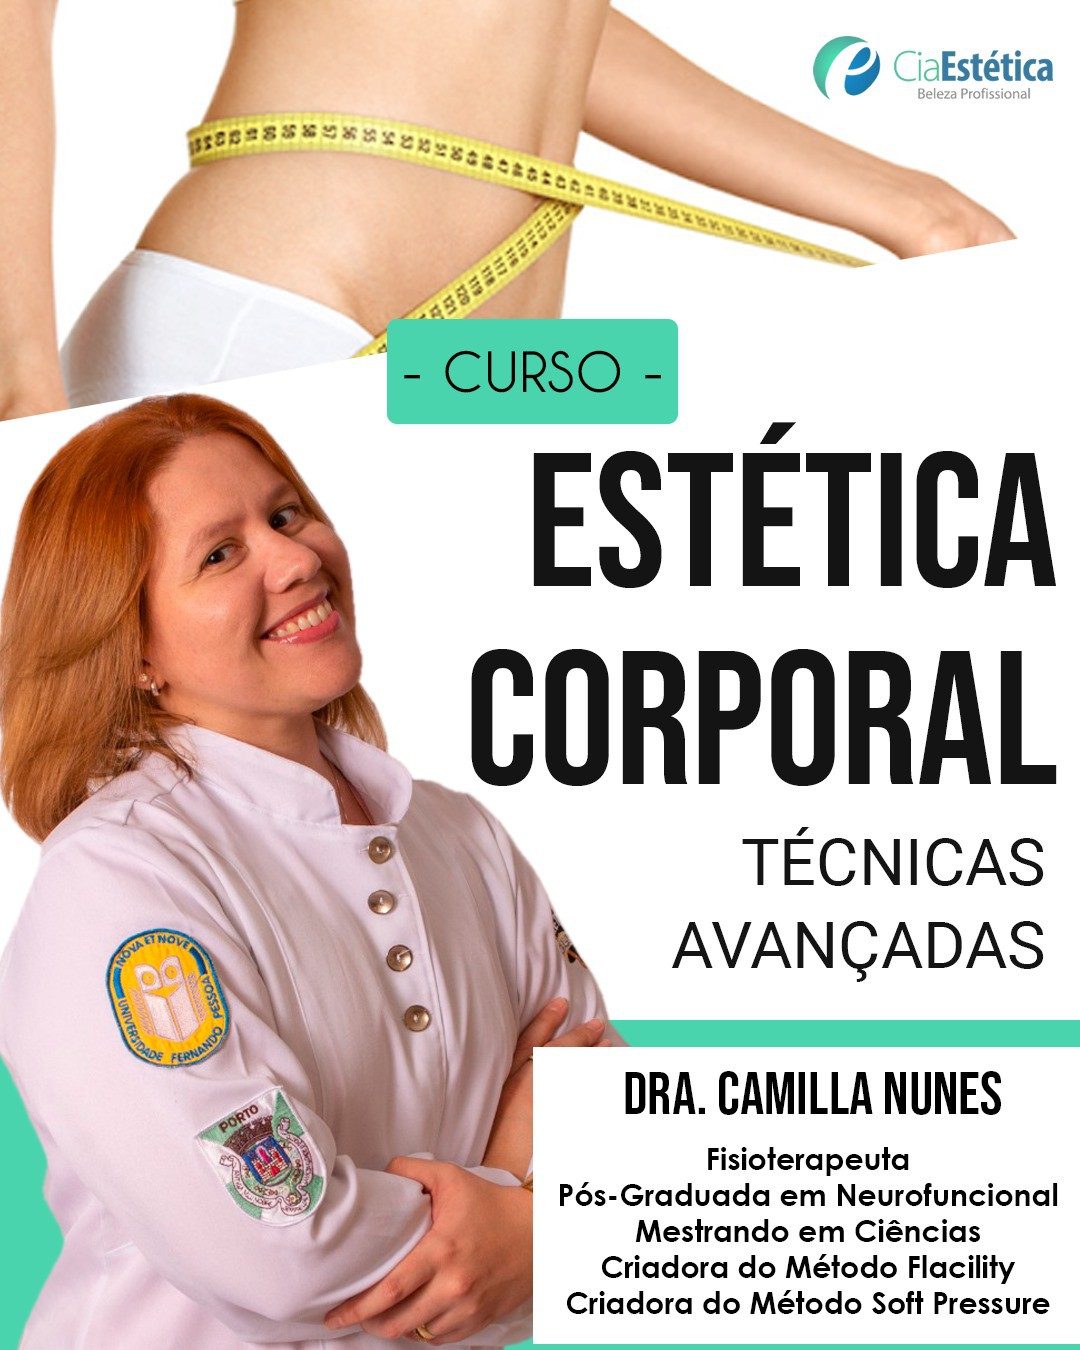 Curso de Estética Corporal Técnicas Avançadas